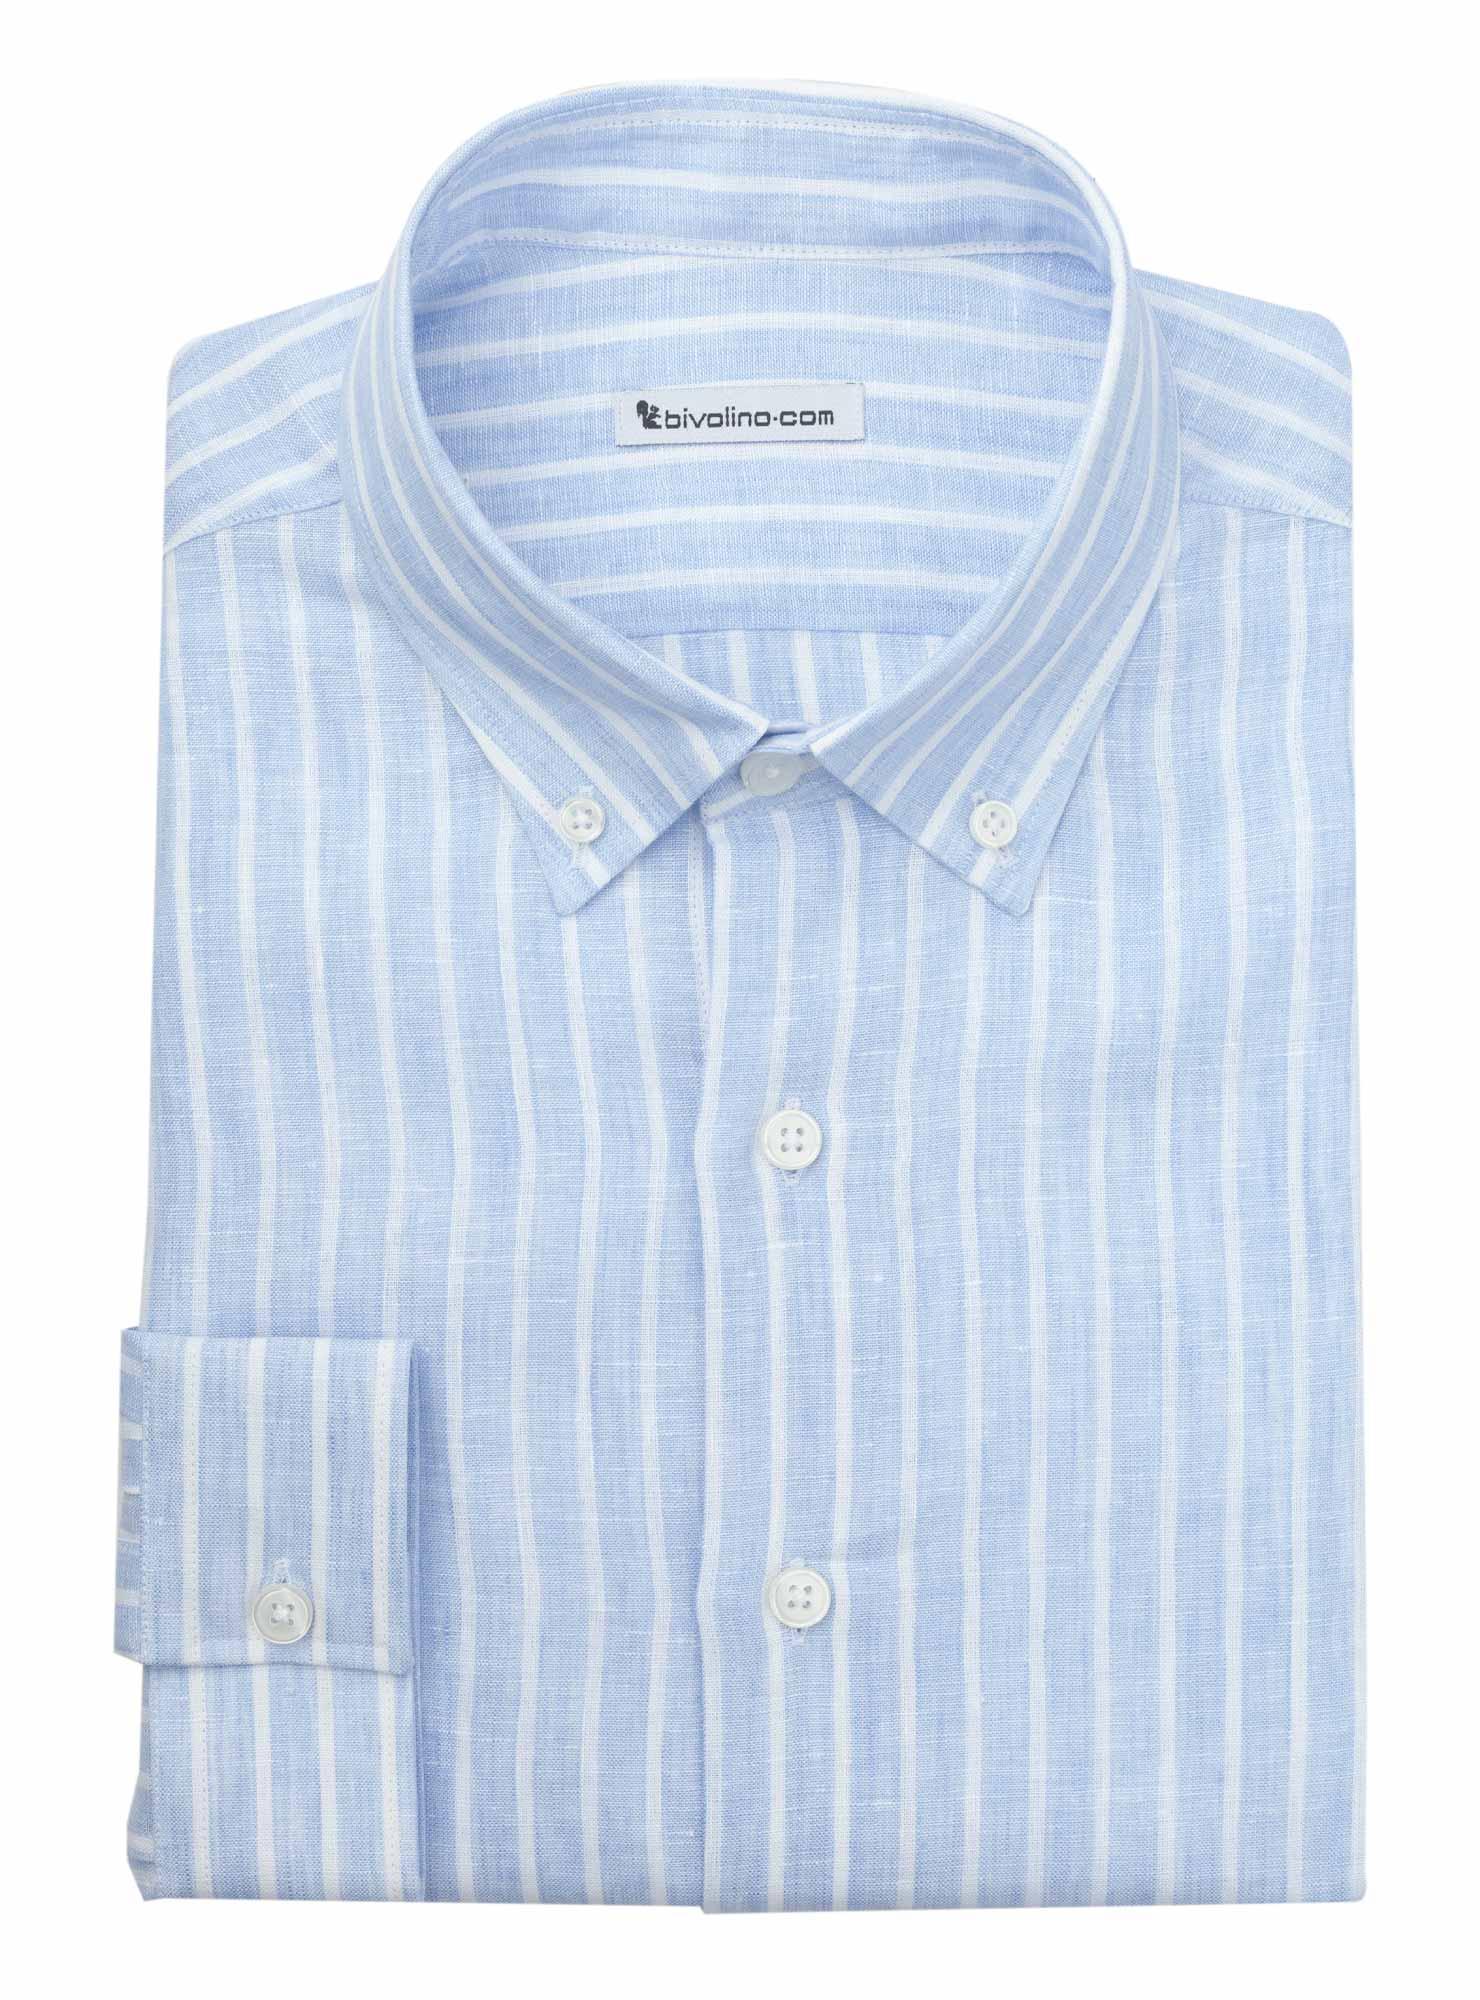 ERACLEA - chemise homme lin à rayure bleu - NEON 1